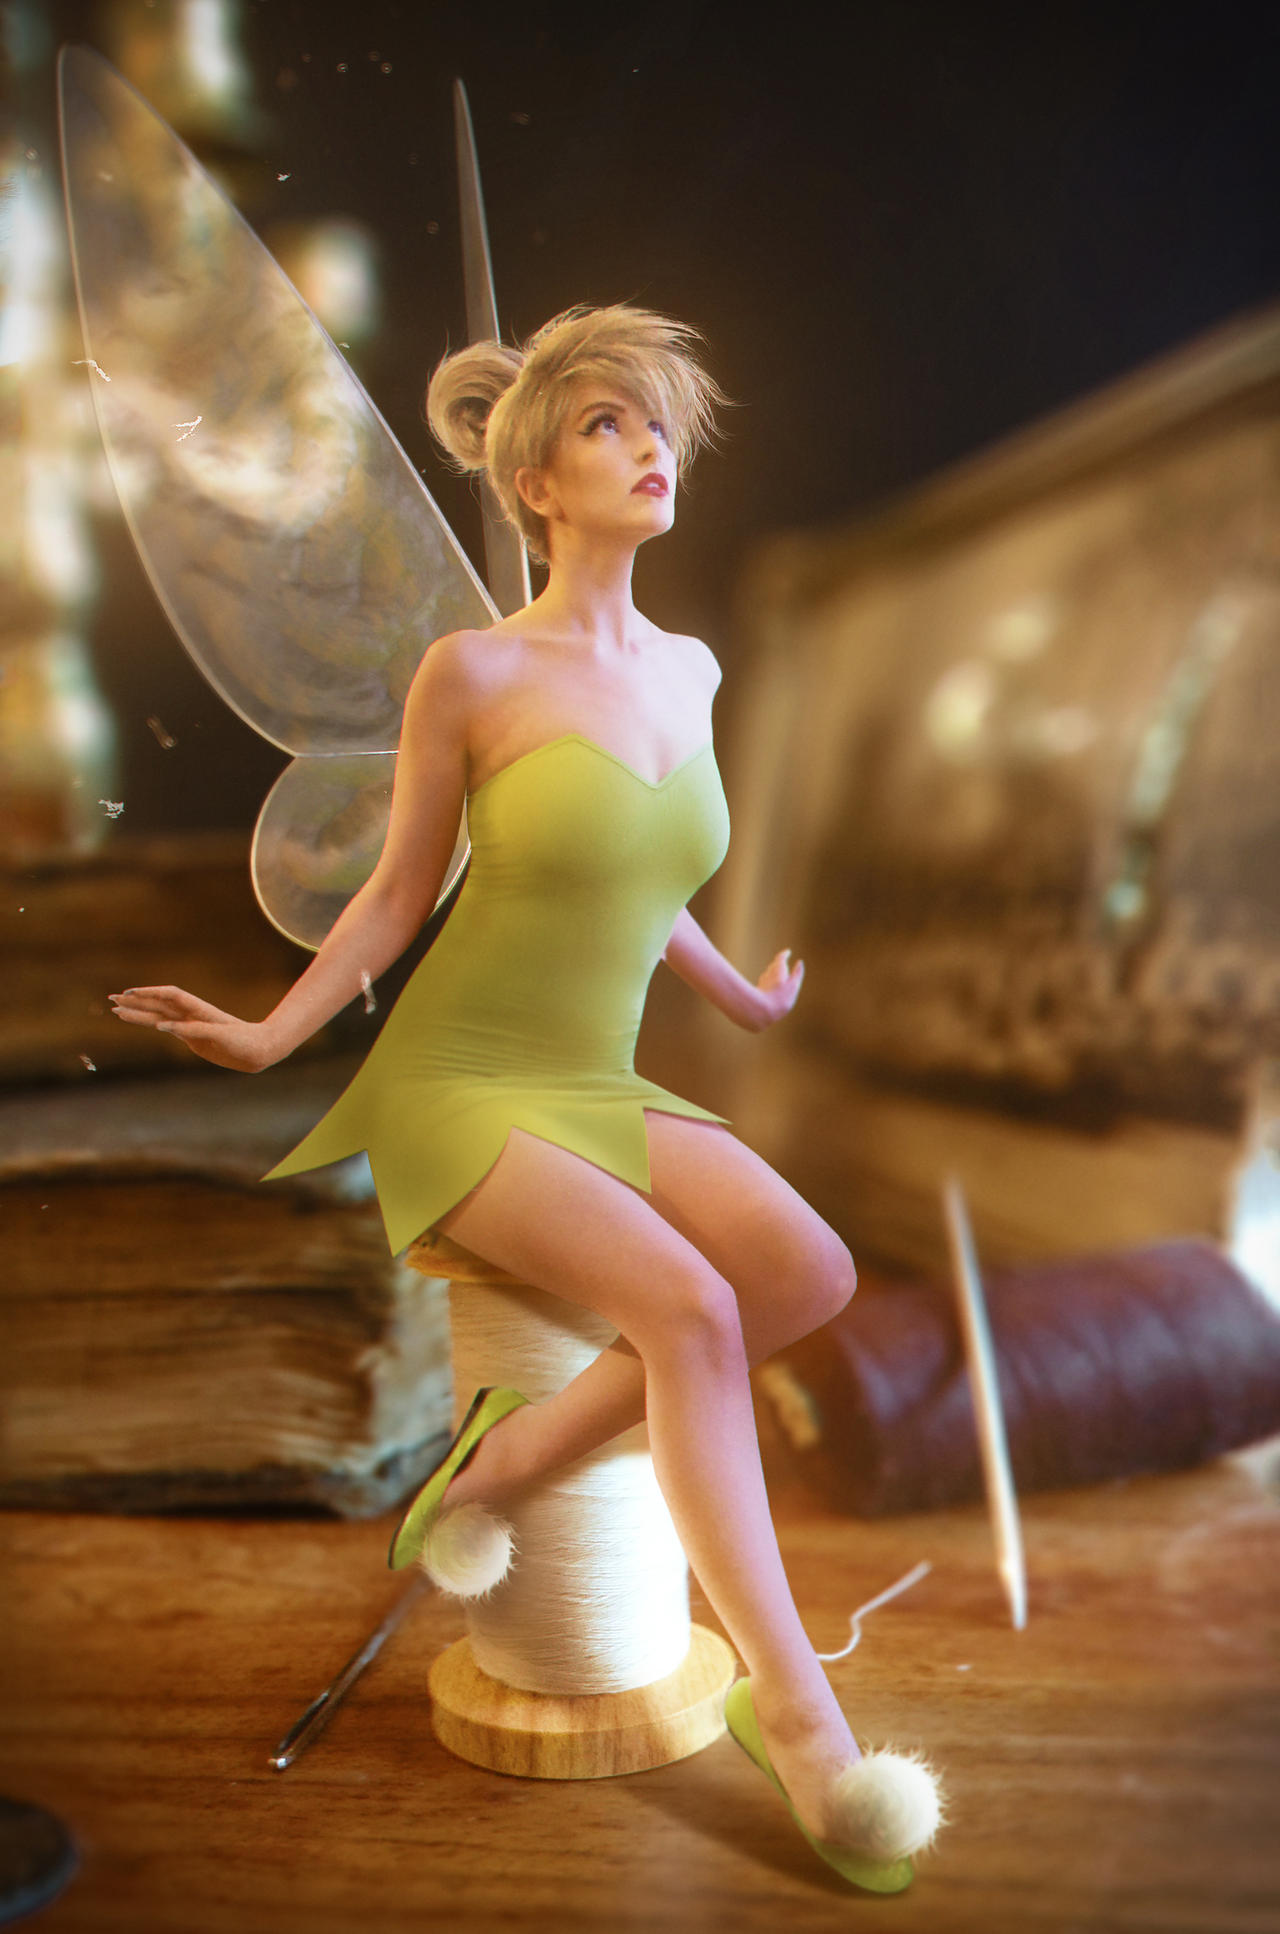 Nude Cartoons: Tinker Bell